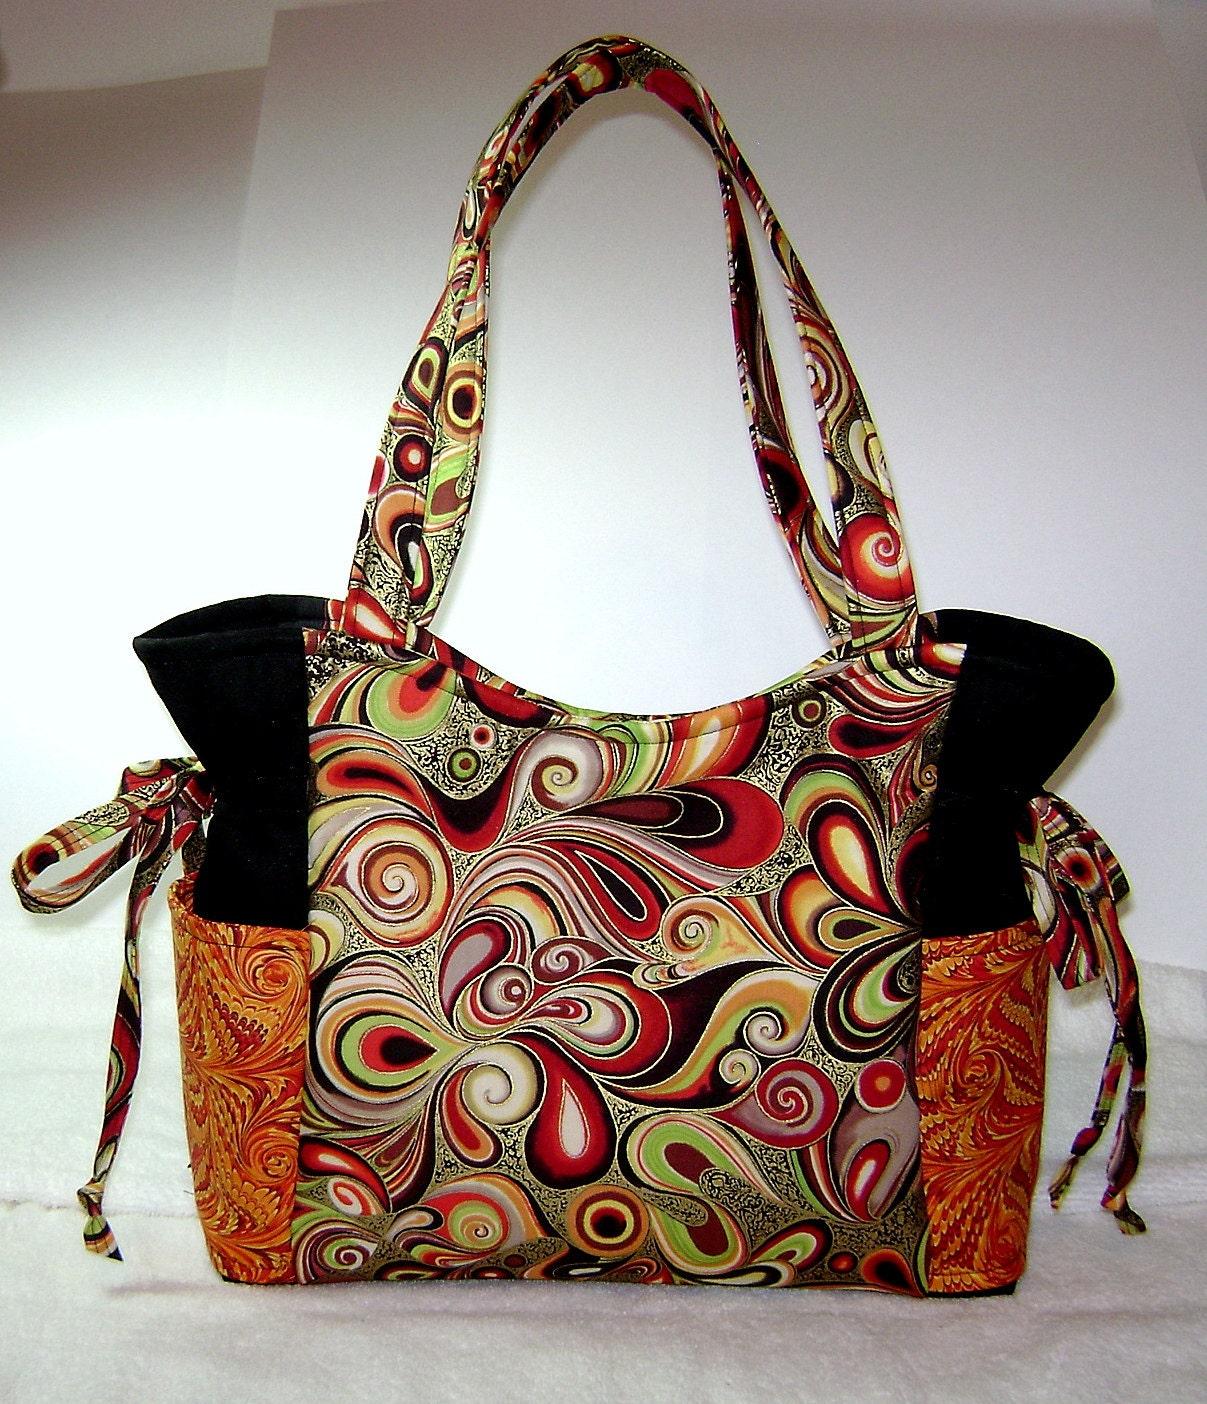 Fabric Handbag Handmade Swirl Fabrics Artsy Art Purse - photo#25